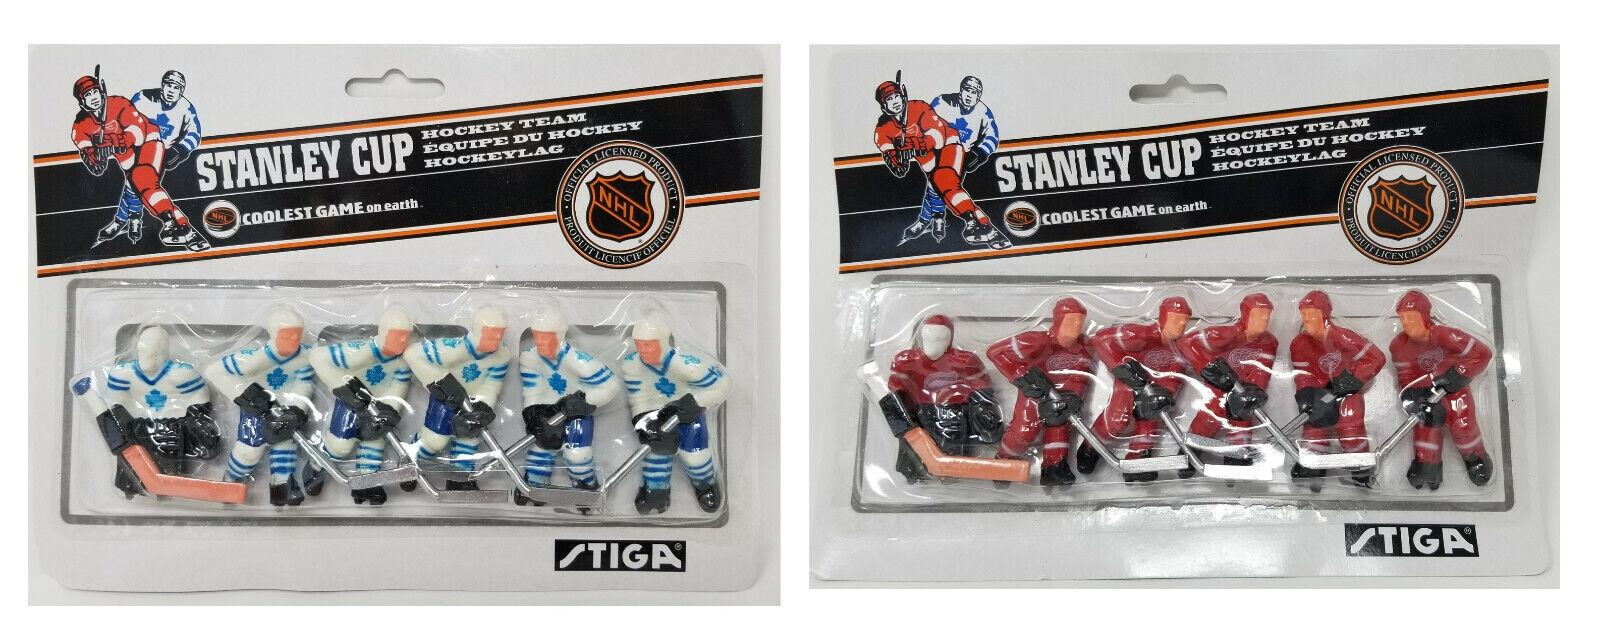 Stiga Detroit Red Wings & Toronto Maple Leafs Table Rod Hock